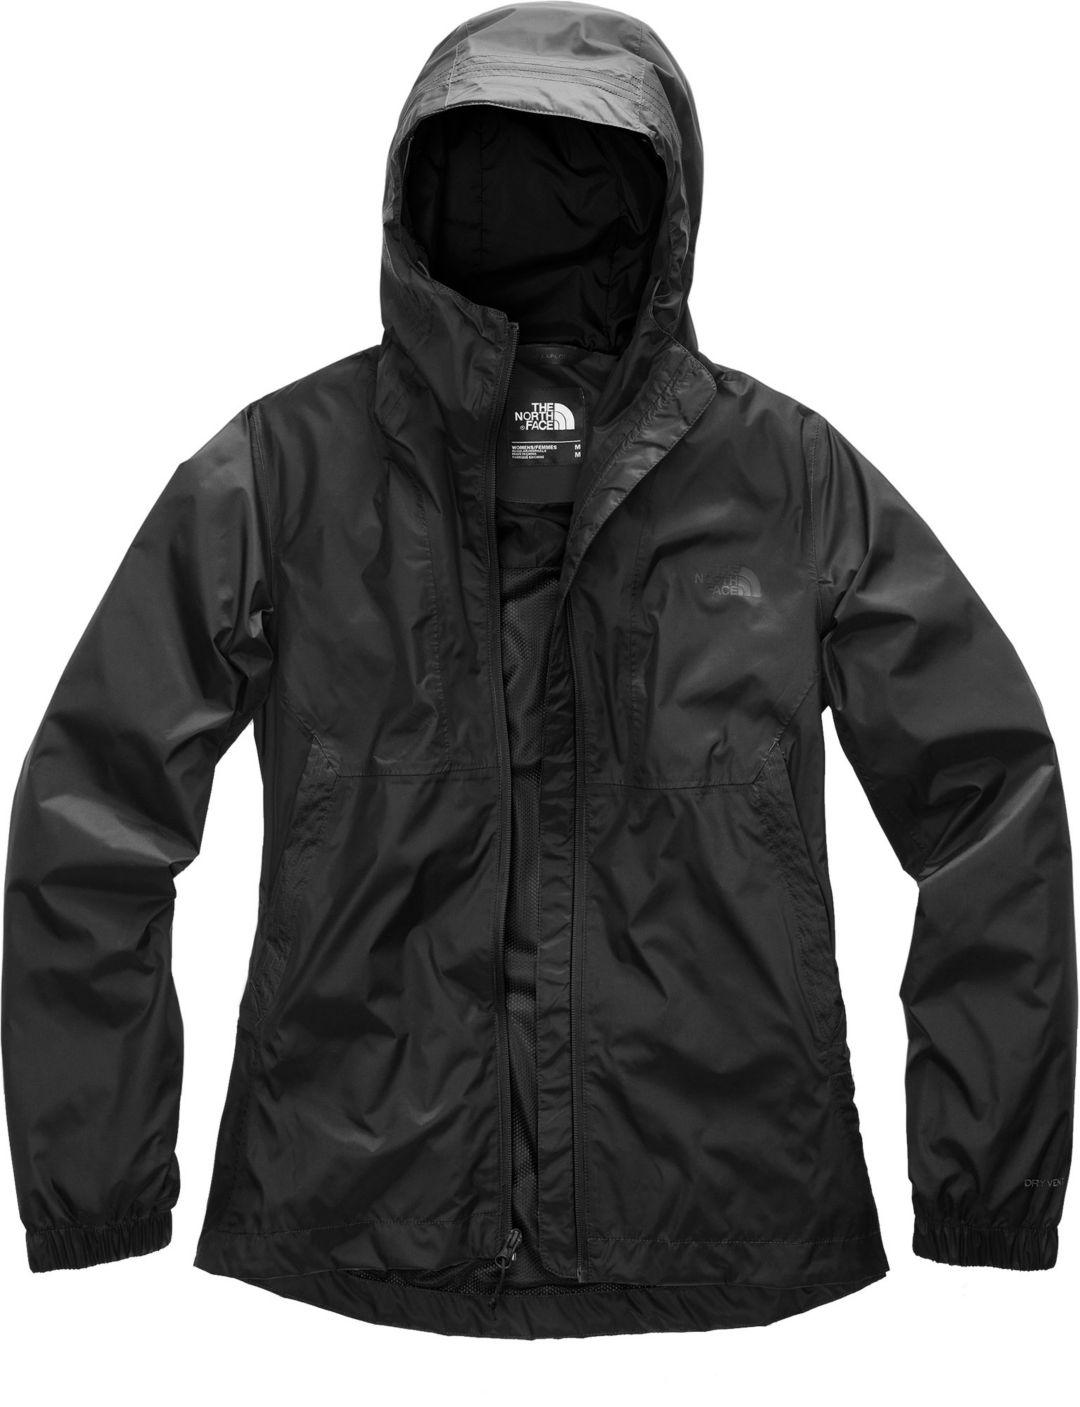 b38c9d53d The North Face Women's Phantastic Rain Jacket